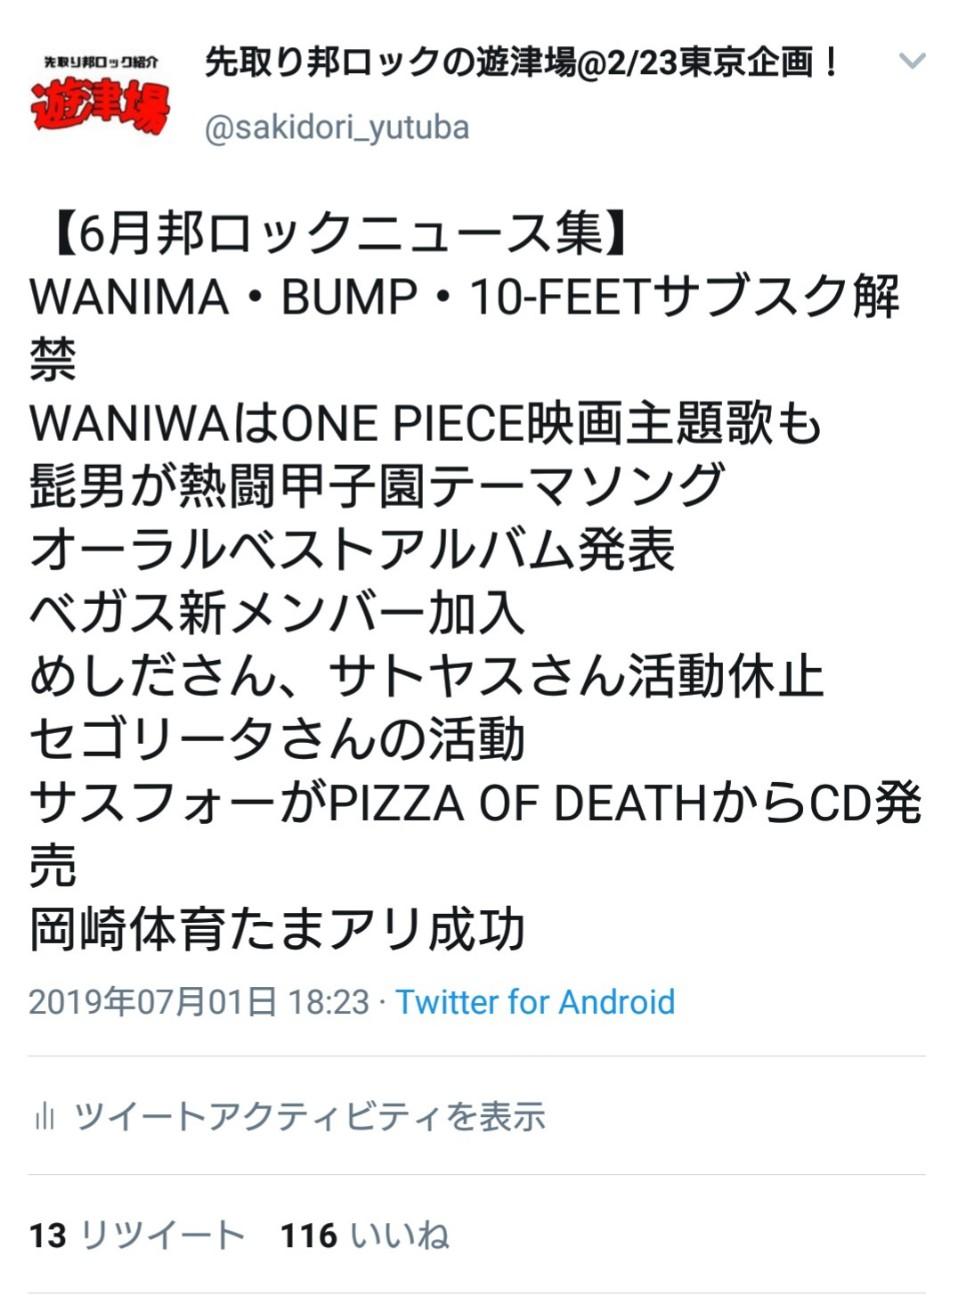 f:id:sakidoriyutsubarock:20191218110032j:plain